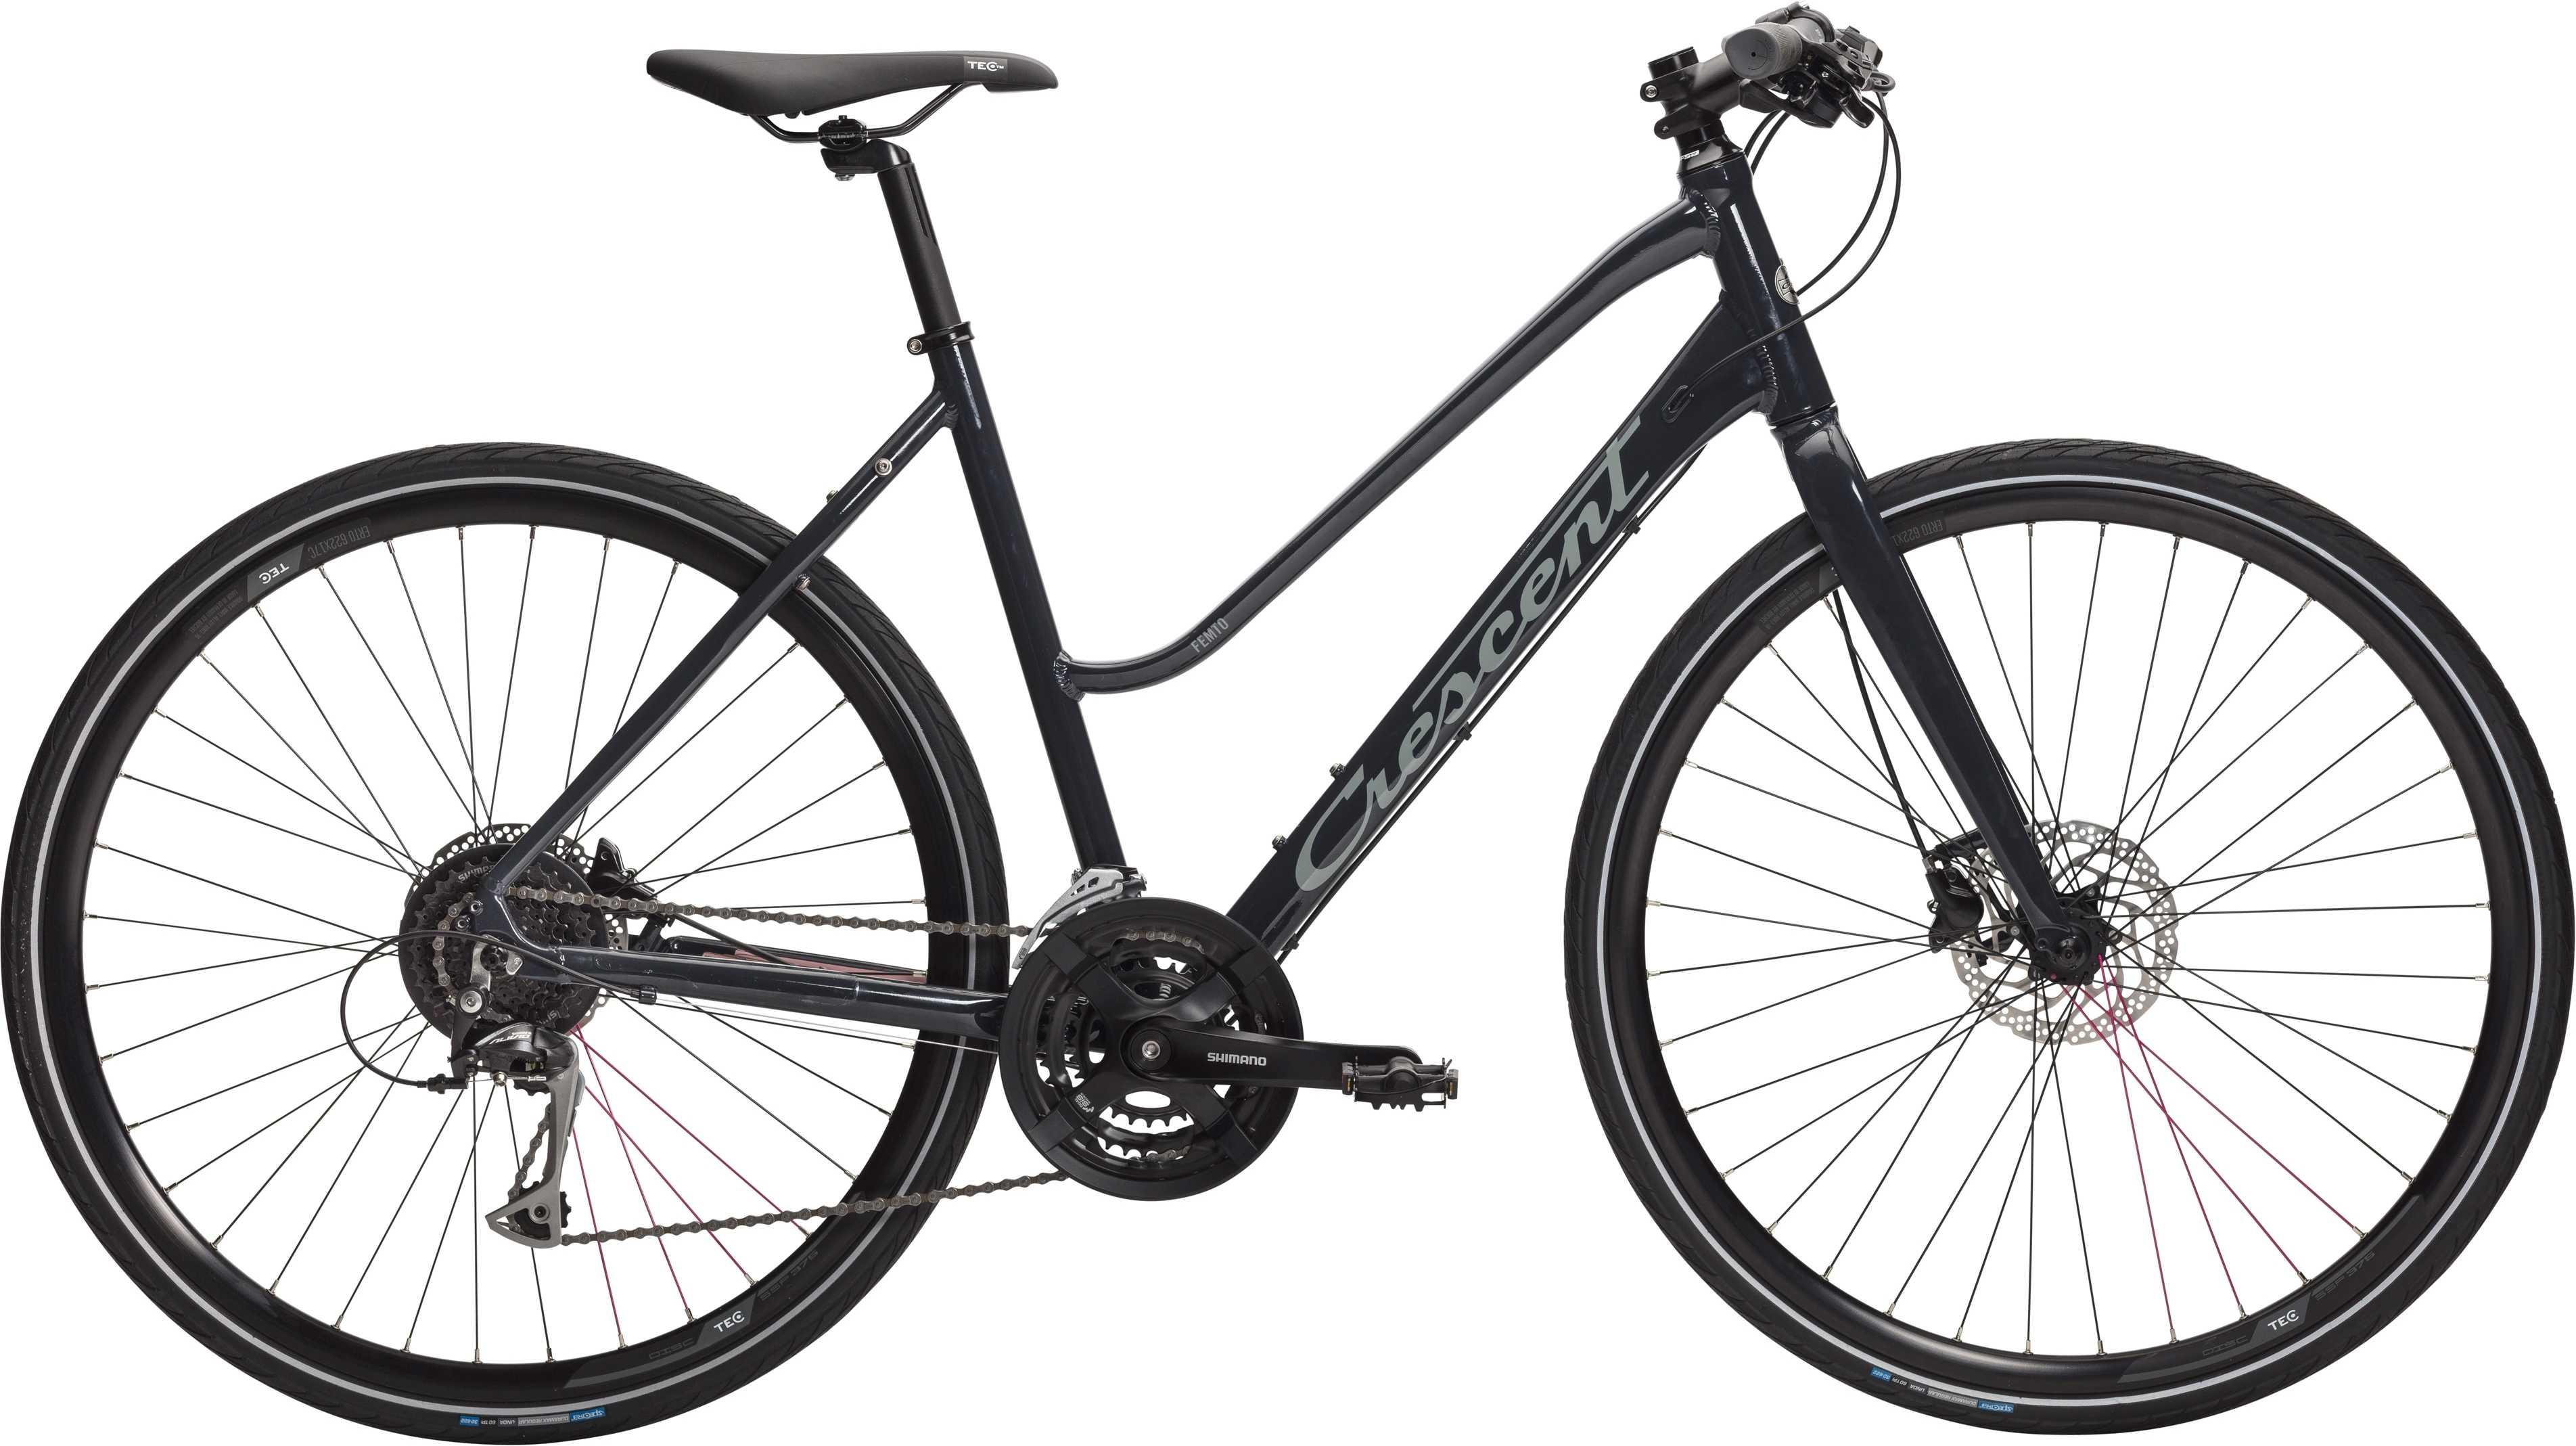 CRESCENT FEMTO MATGR | City-cykler